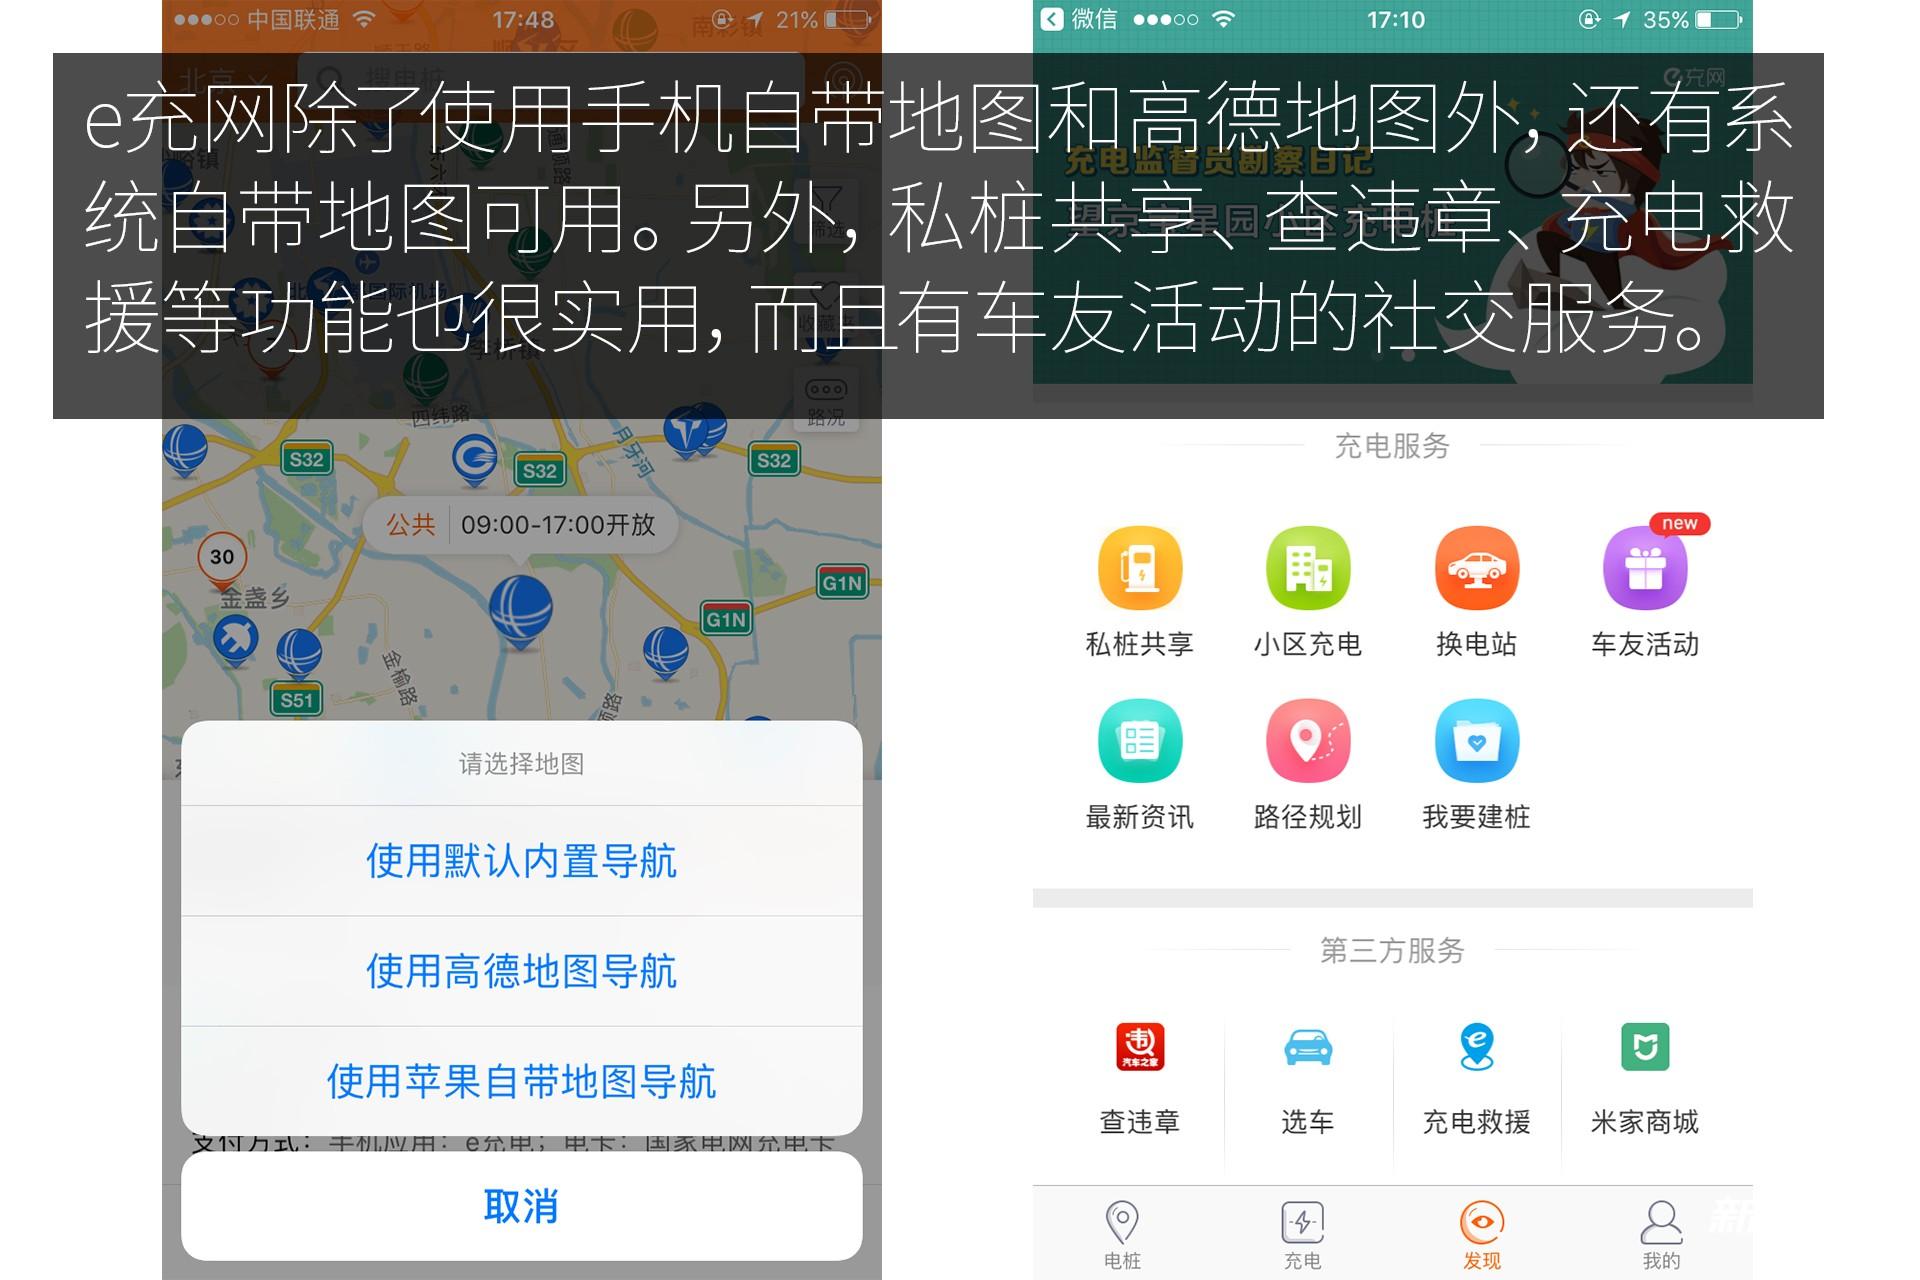 e充网的导航和服务.jpg